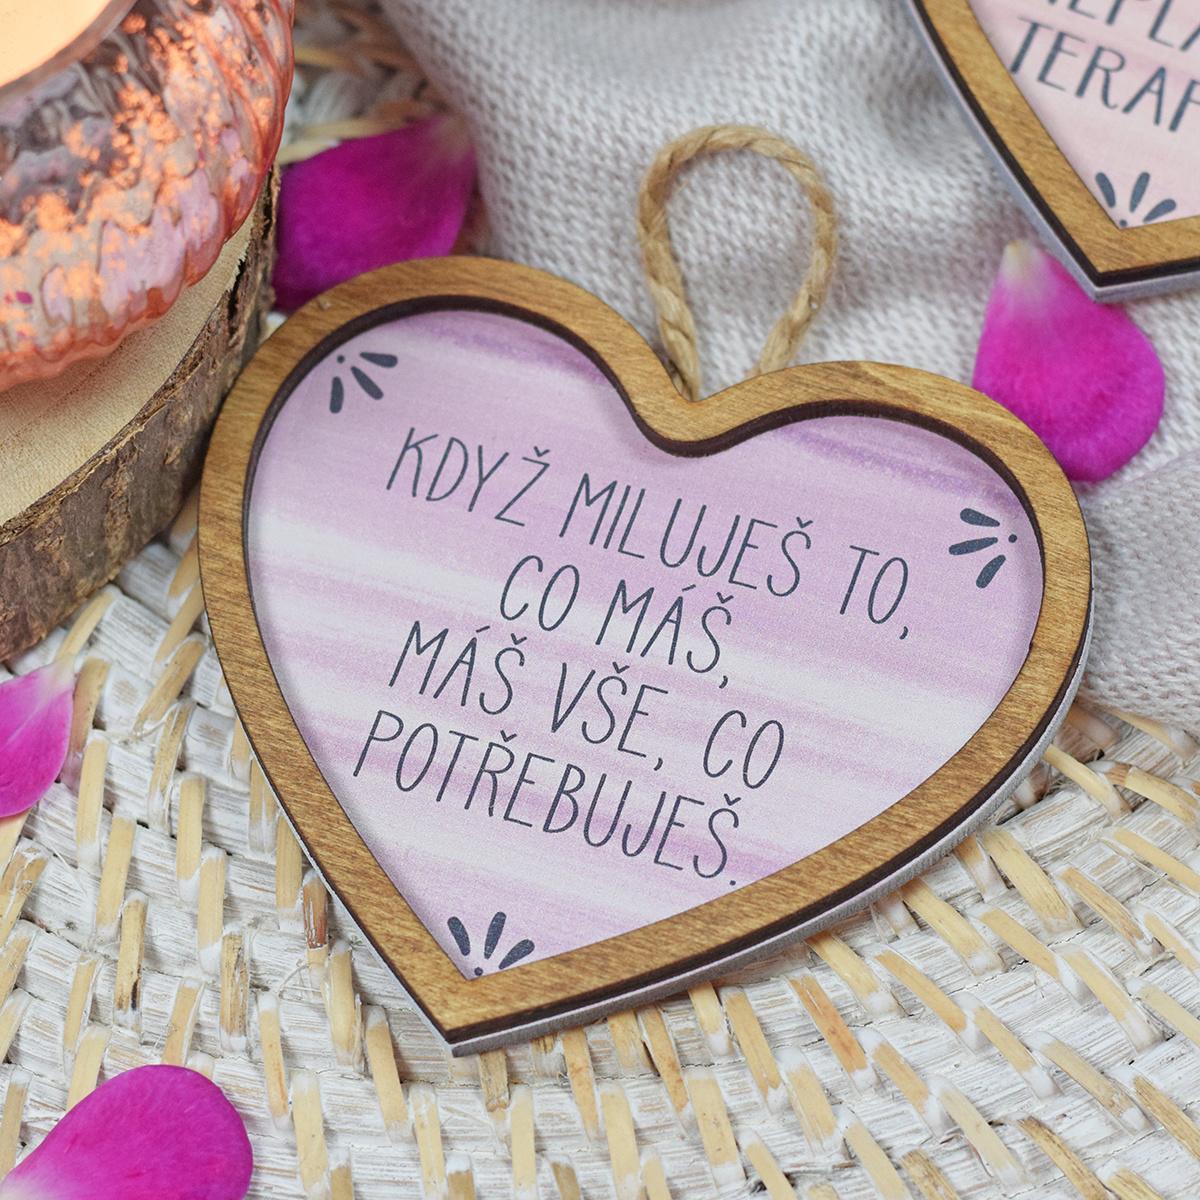 HOUSEDECOR Srdce pro radost - Miluj to, co máš